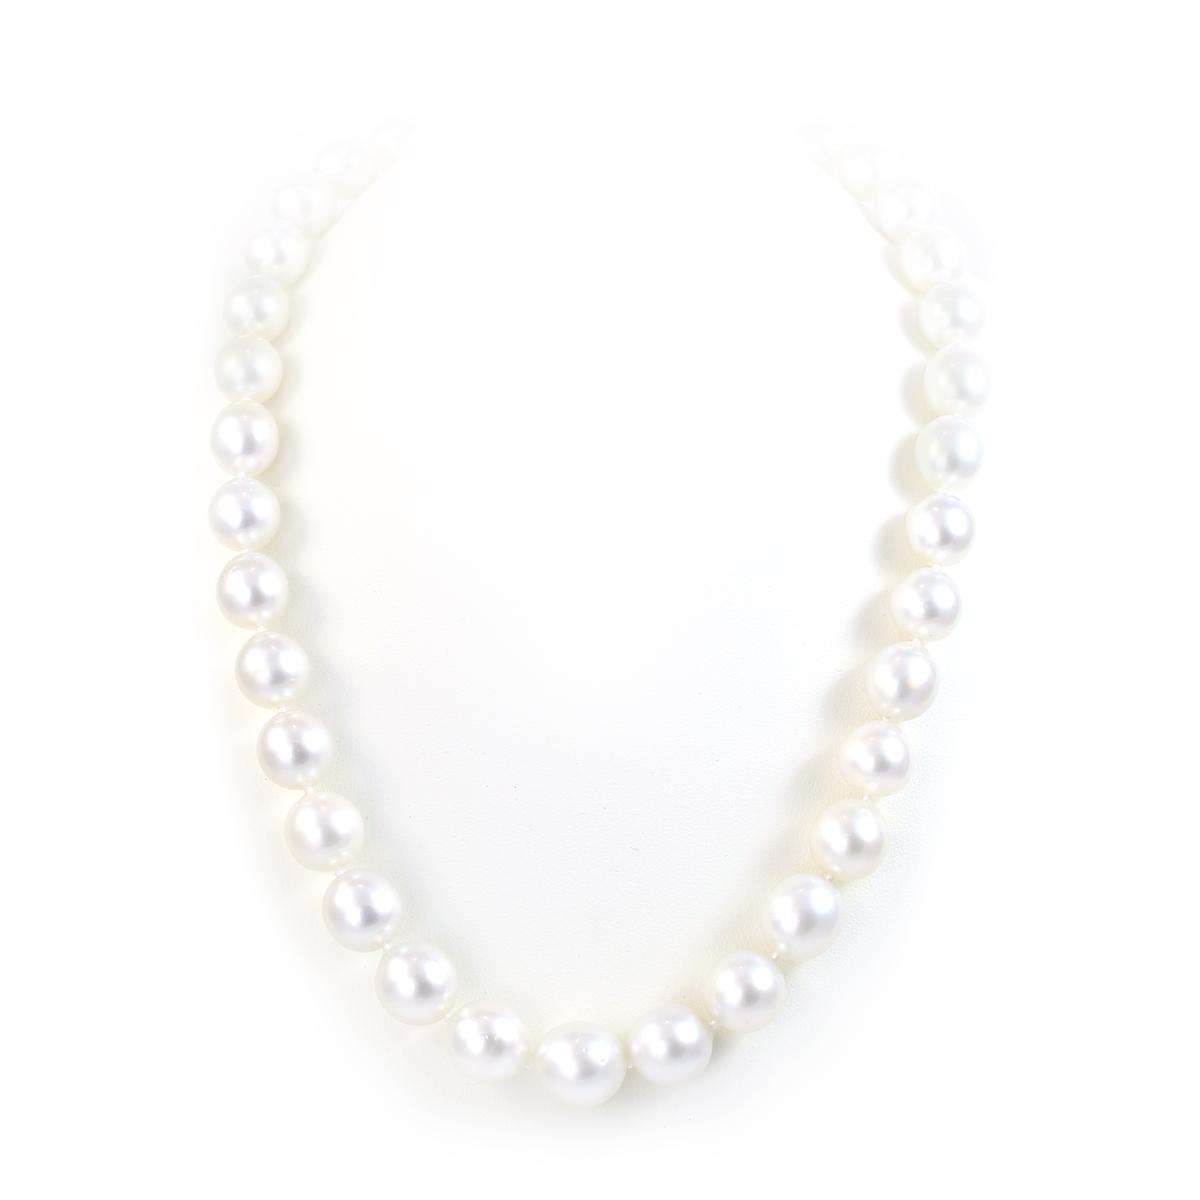 14 Karat White Gold 10-11.5mm White South Sea Pearl Necklace